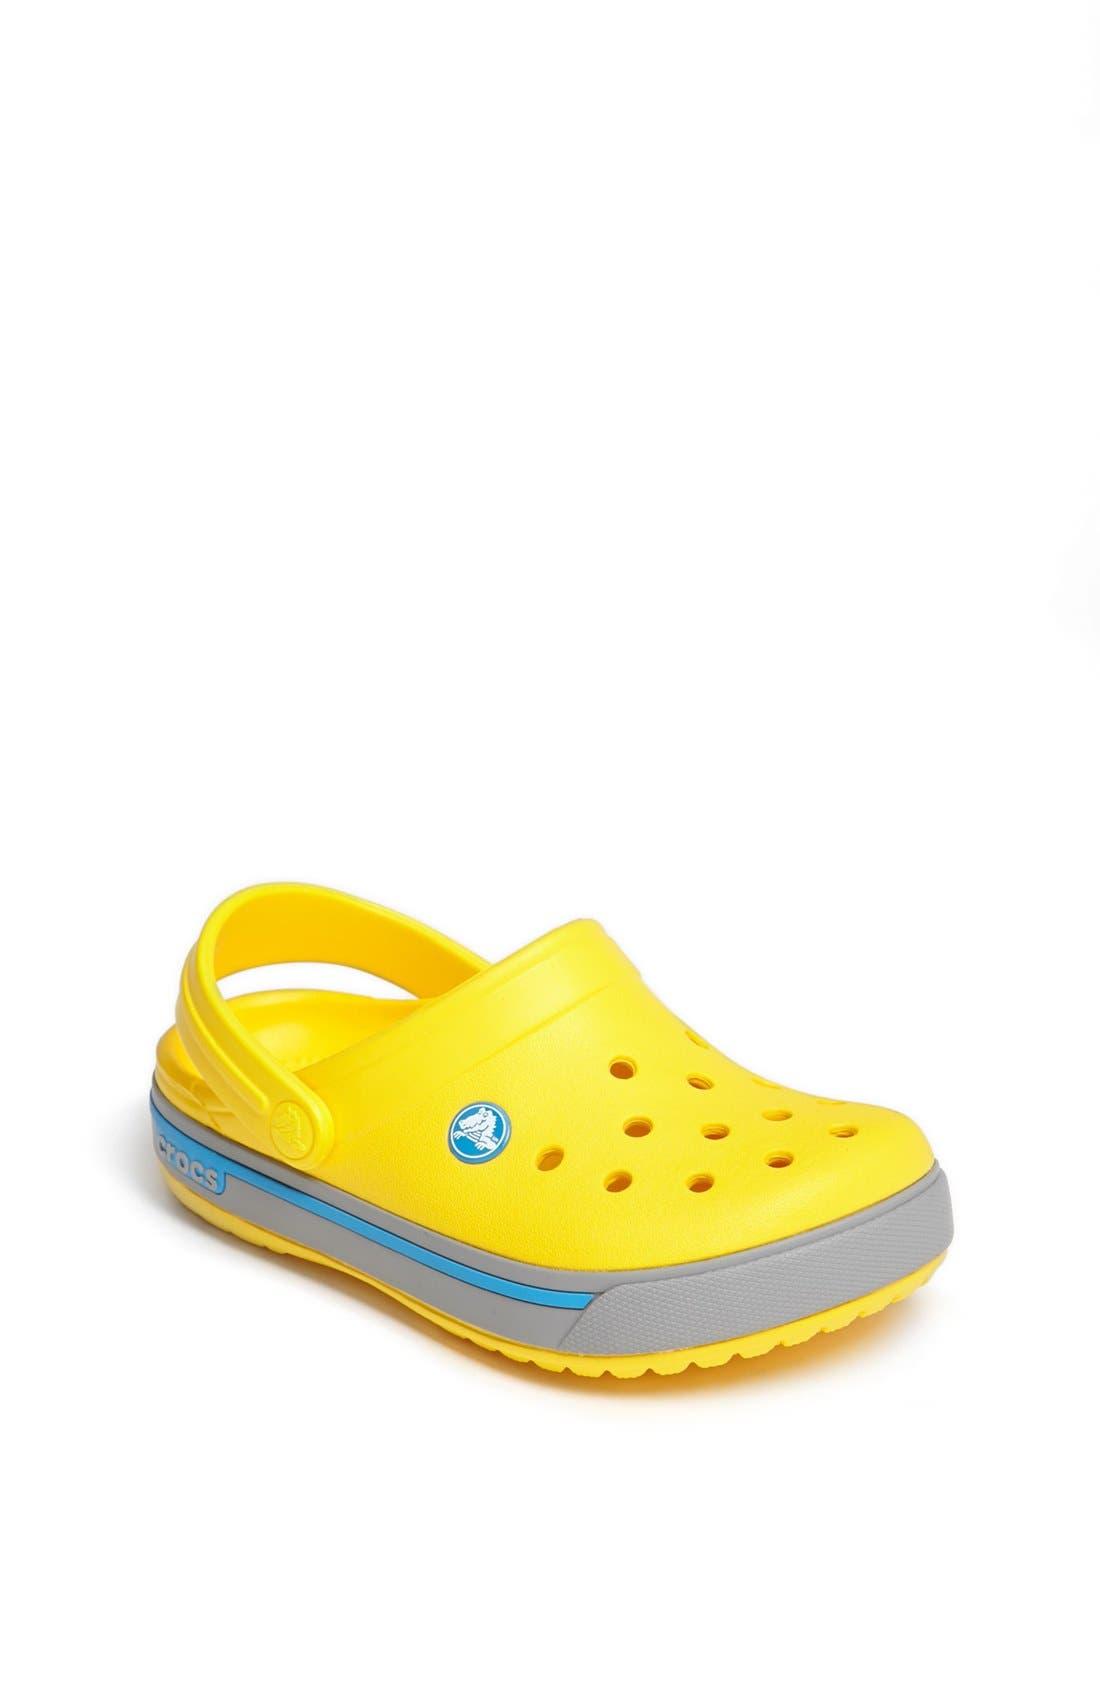 Alternate Image 1 Selected - CROCS™ 'Crocband II.5' Slip-On (Walker, Toddler & Little Kid)